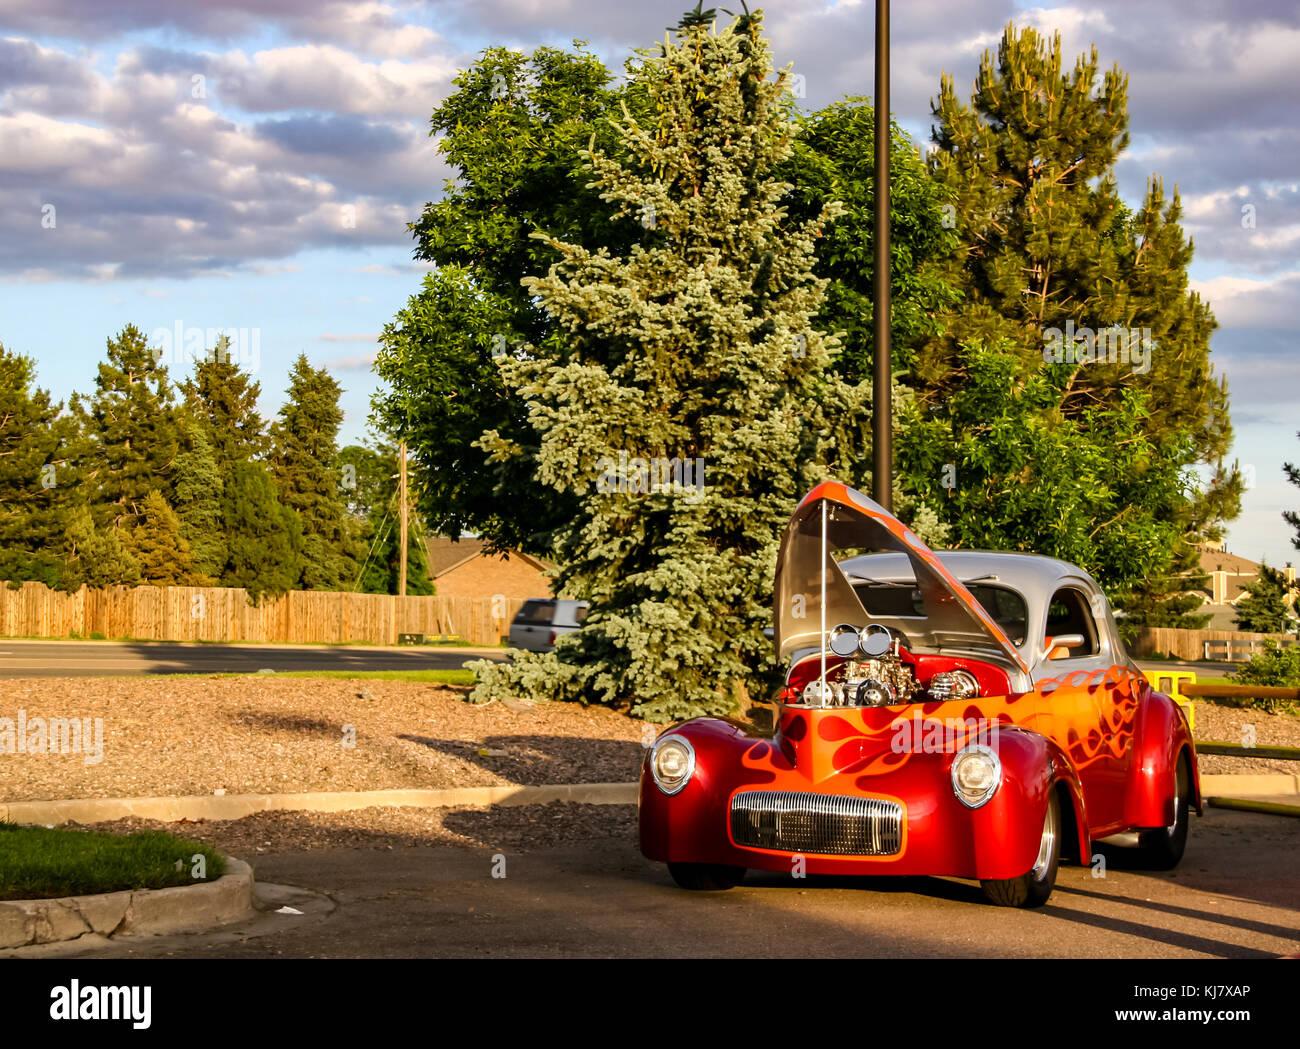 Classic Cars Denver >> Classic Car At Burger King Classic Car Show In Denver Stock